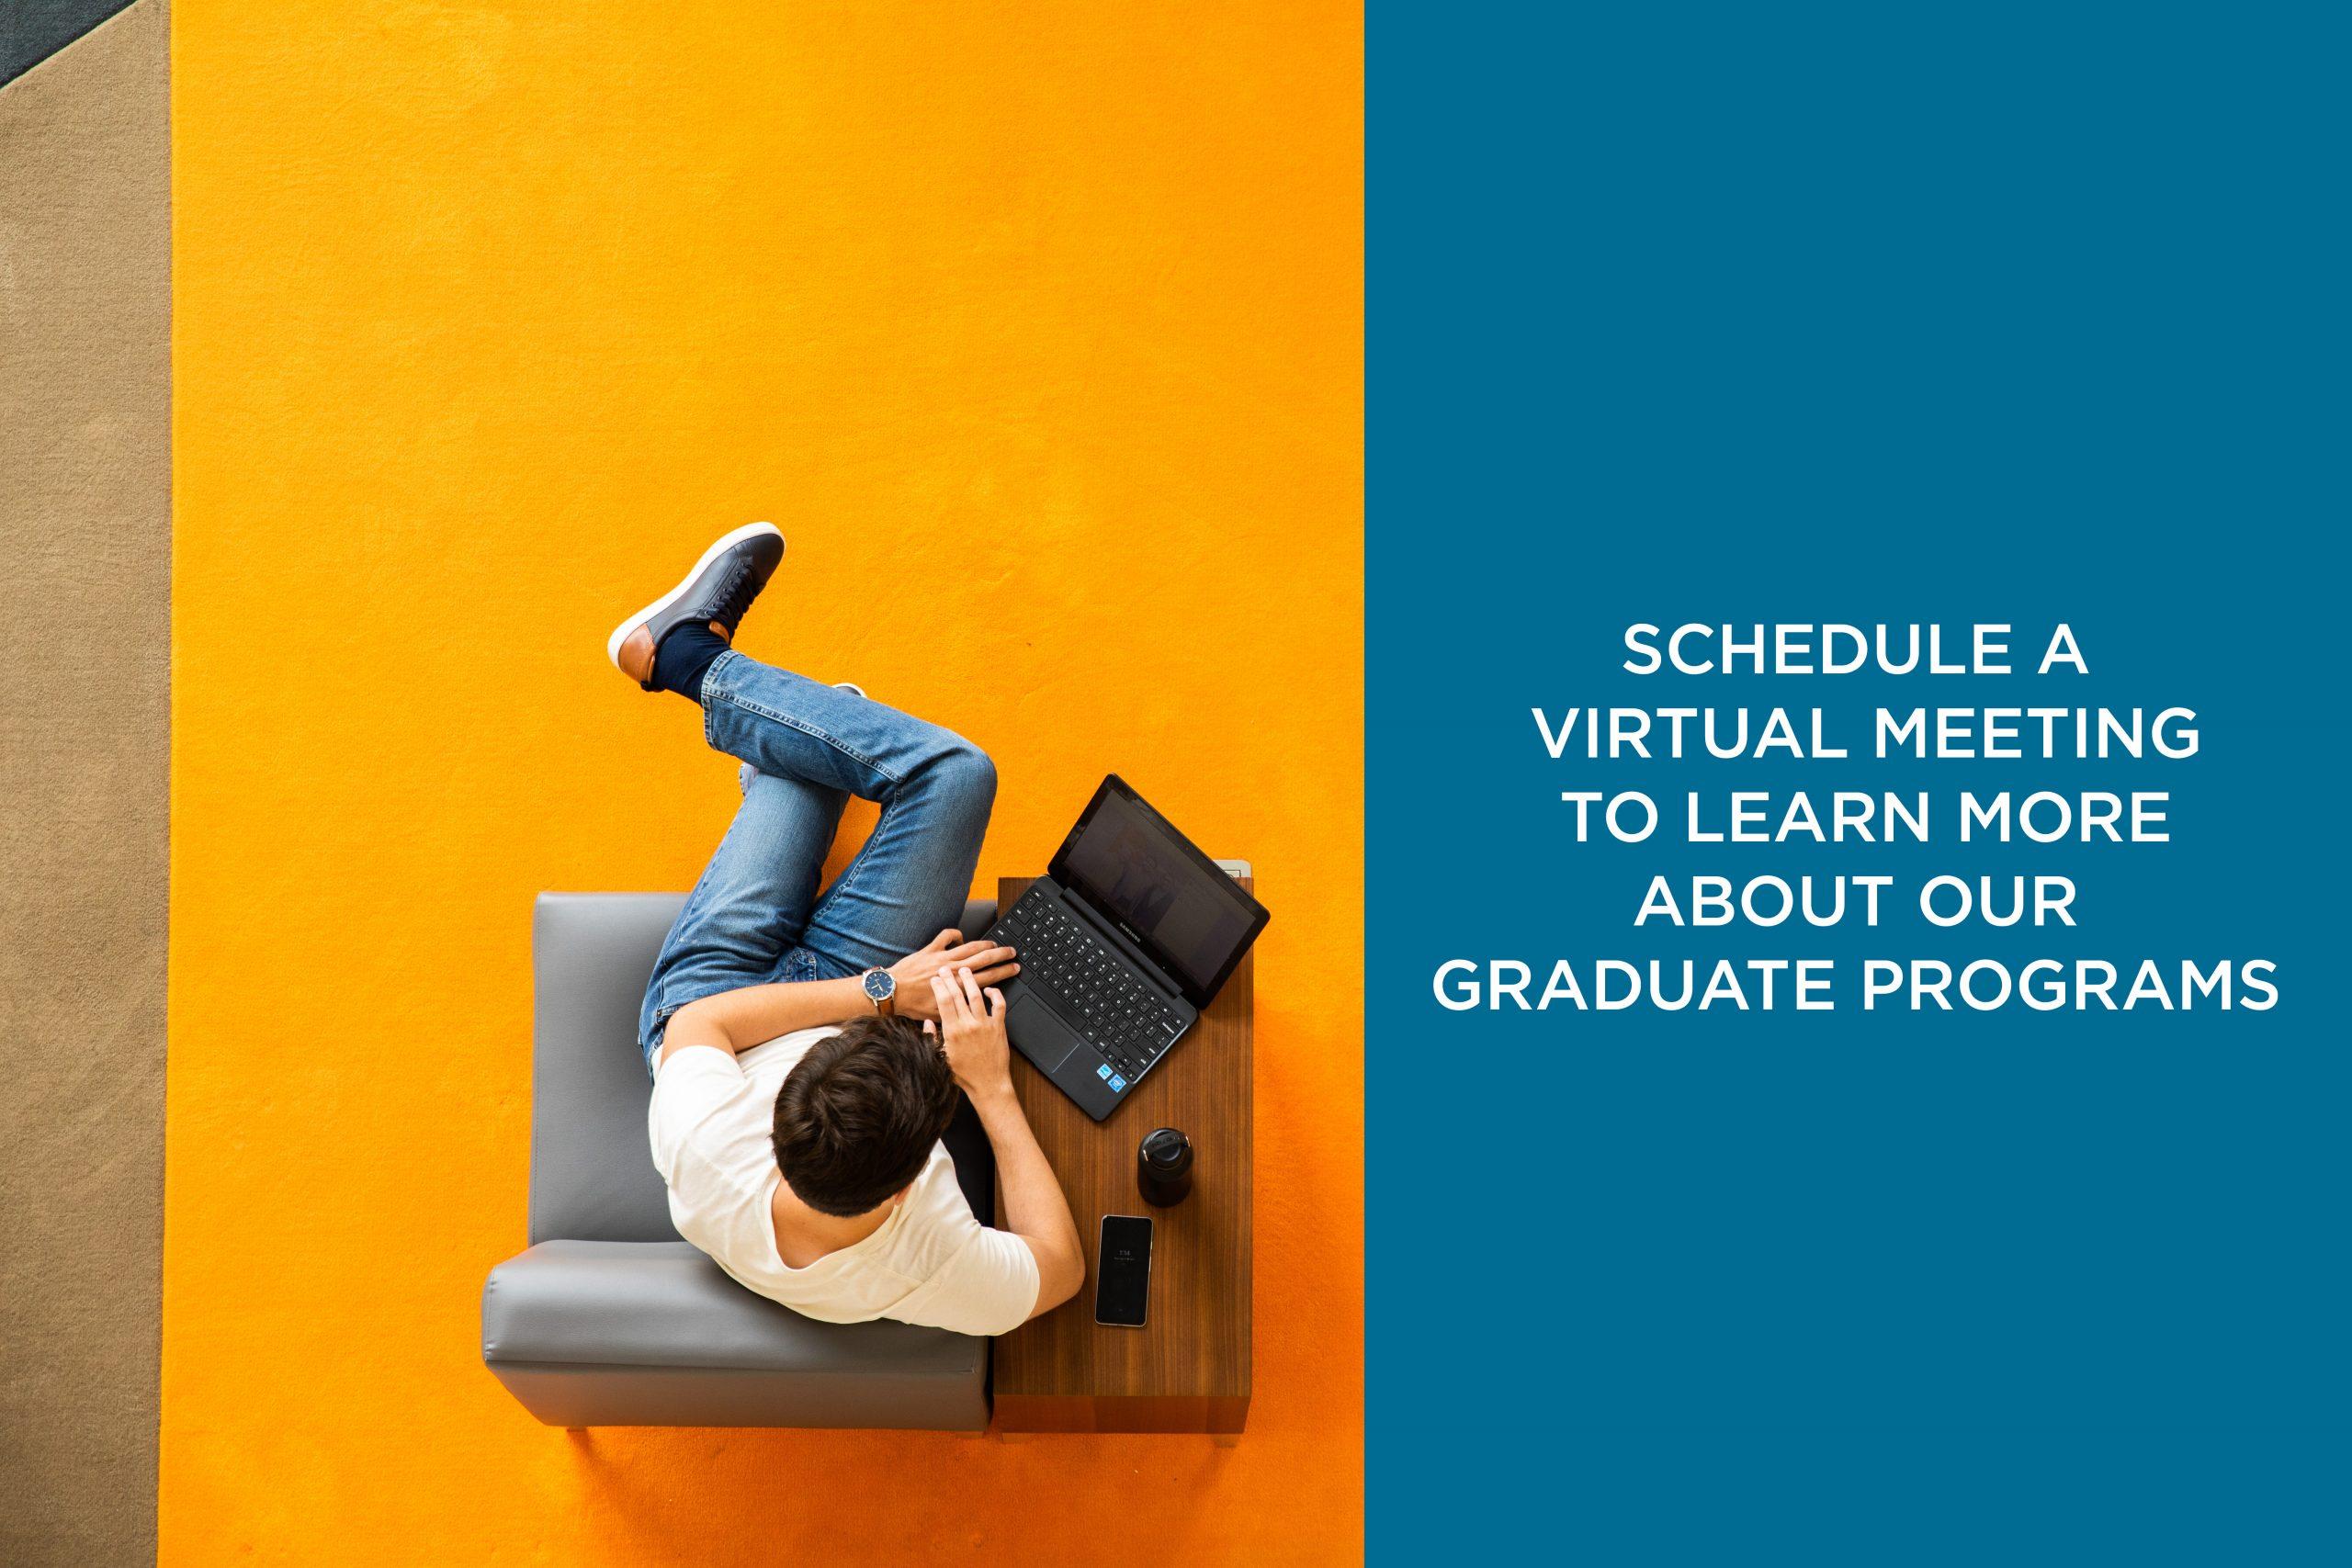 Schedule a Virtual Meeting